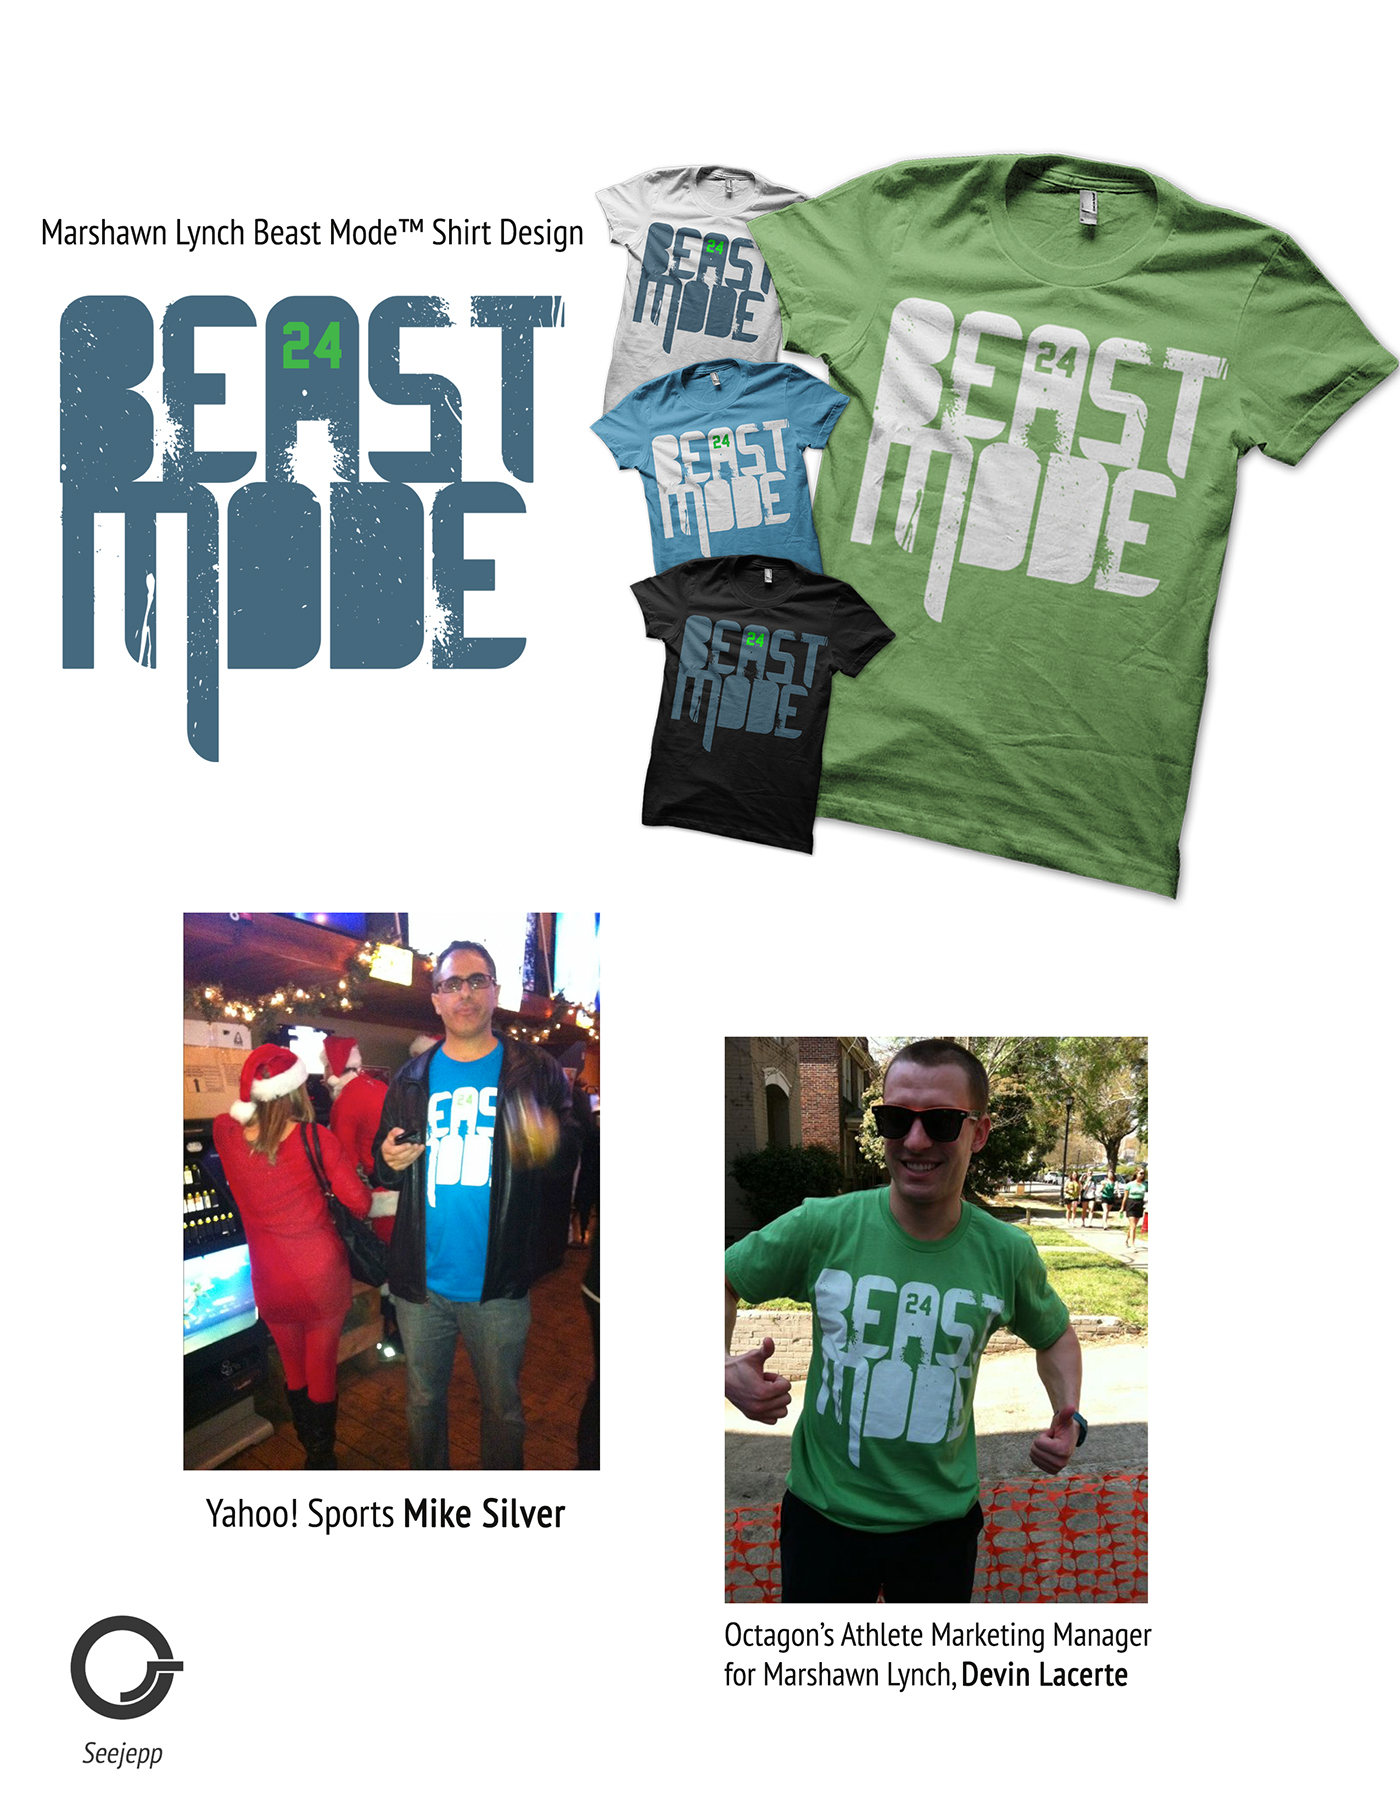 Marshawn Lynch Beast Mode T Shirt Design On Behance